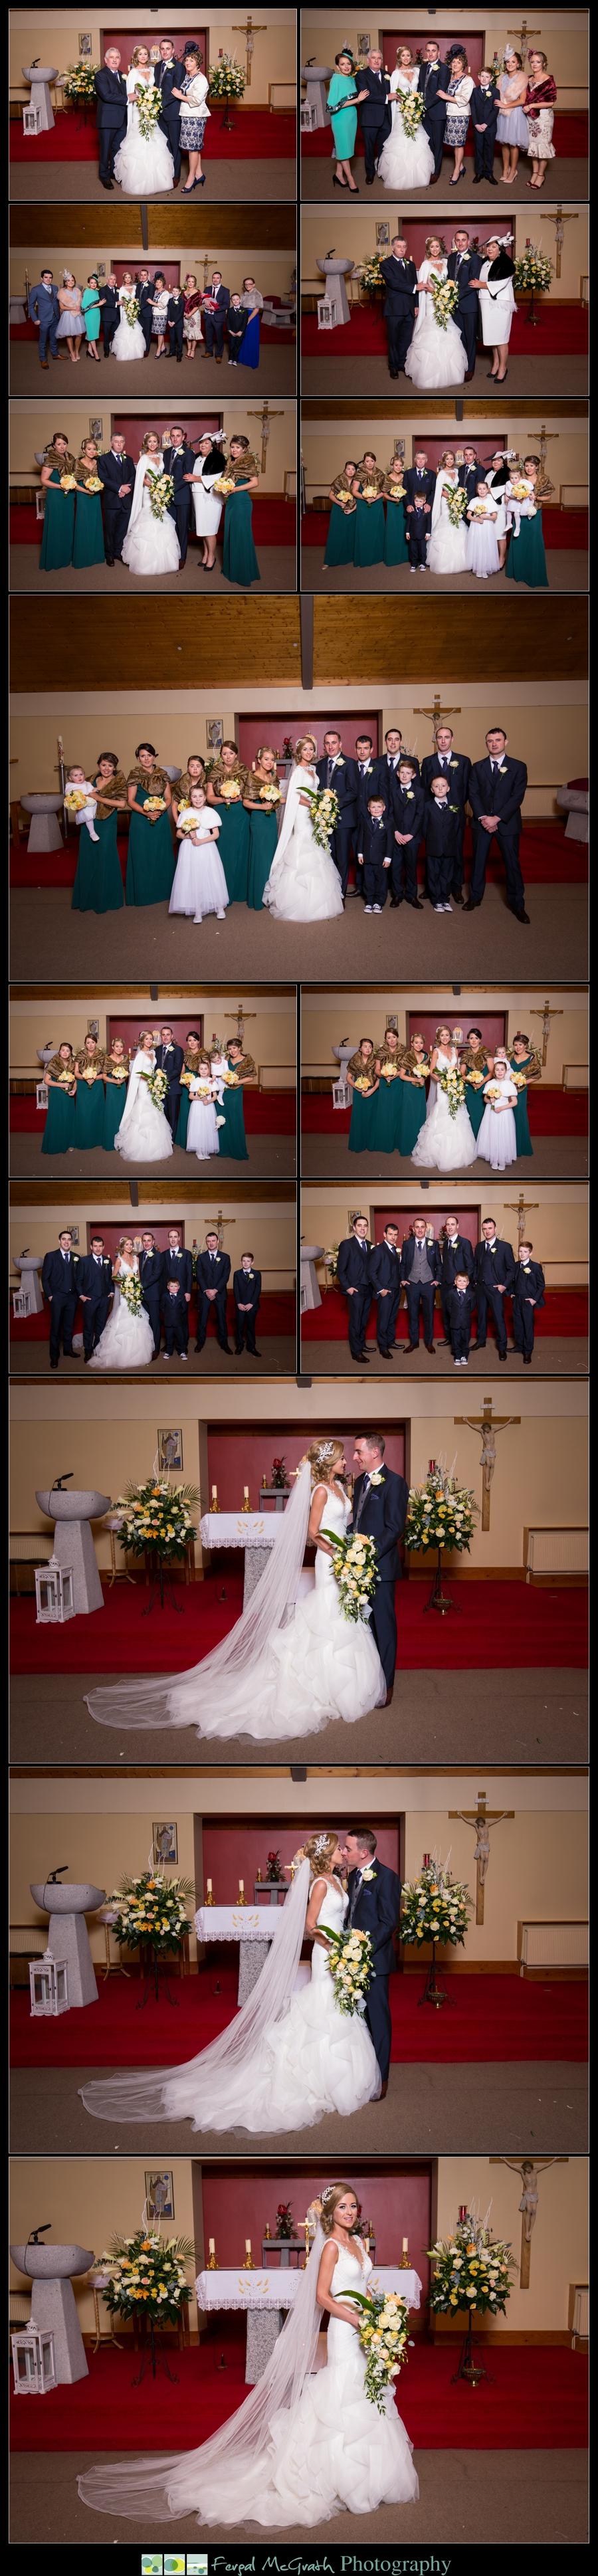 Silver Tassie Hotel Christmas Wedding family photos